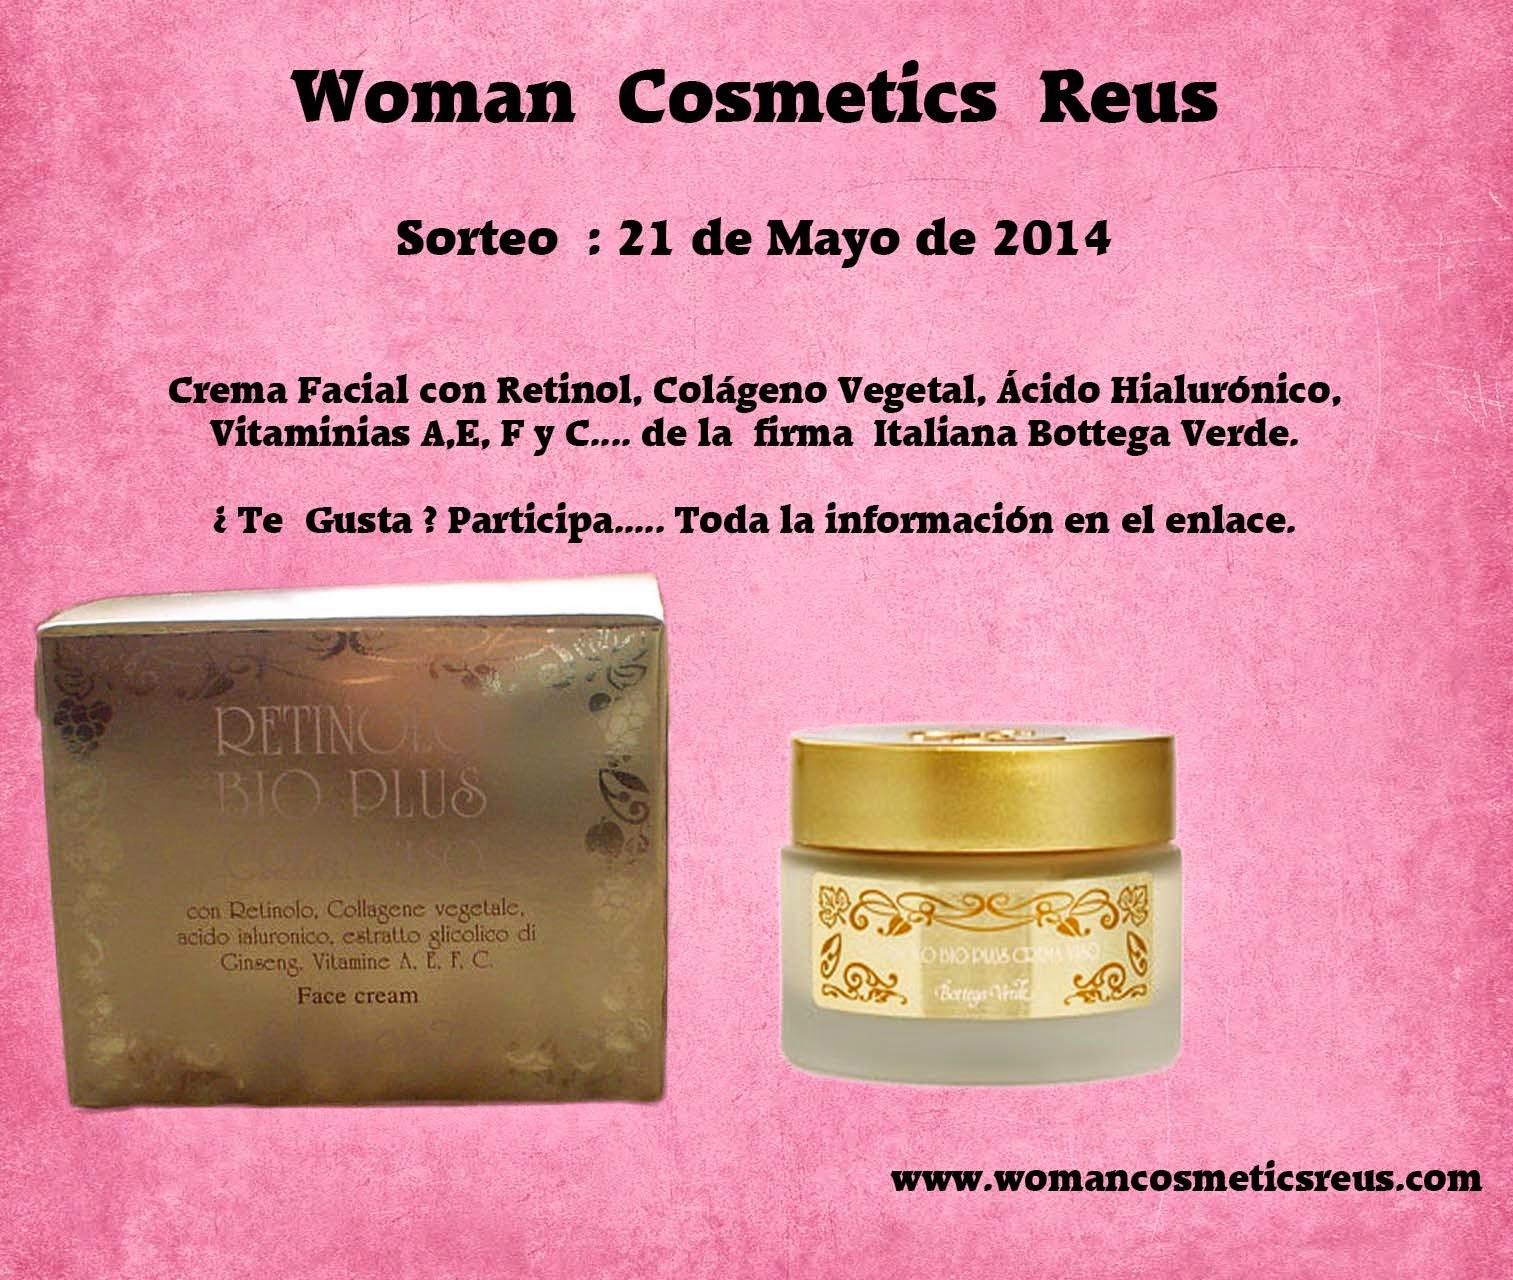 SORTEO PRIMAVERA 09-04-2014